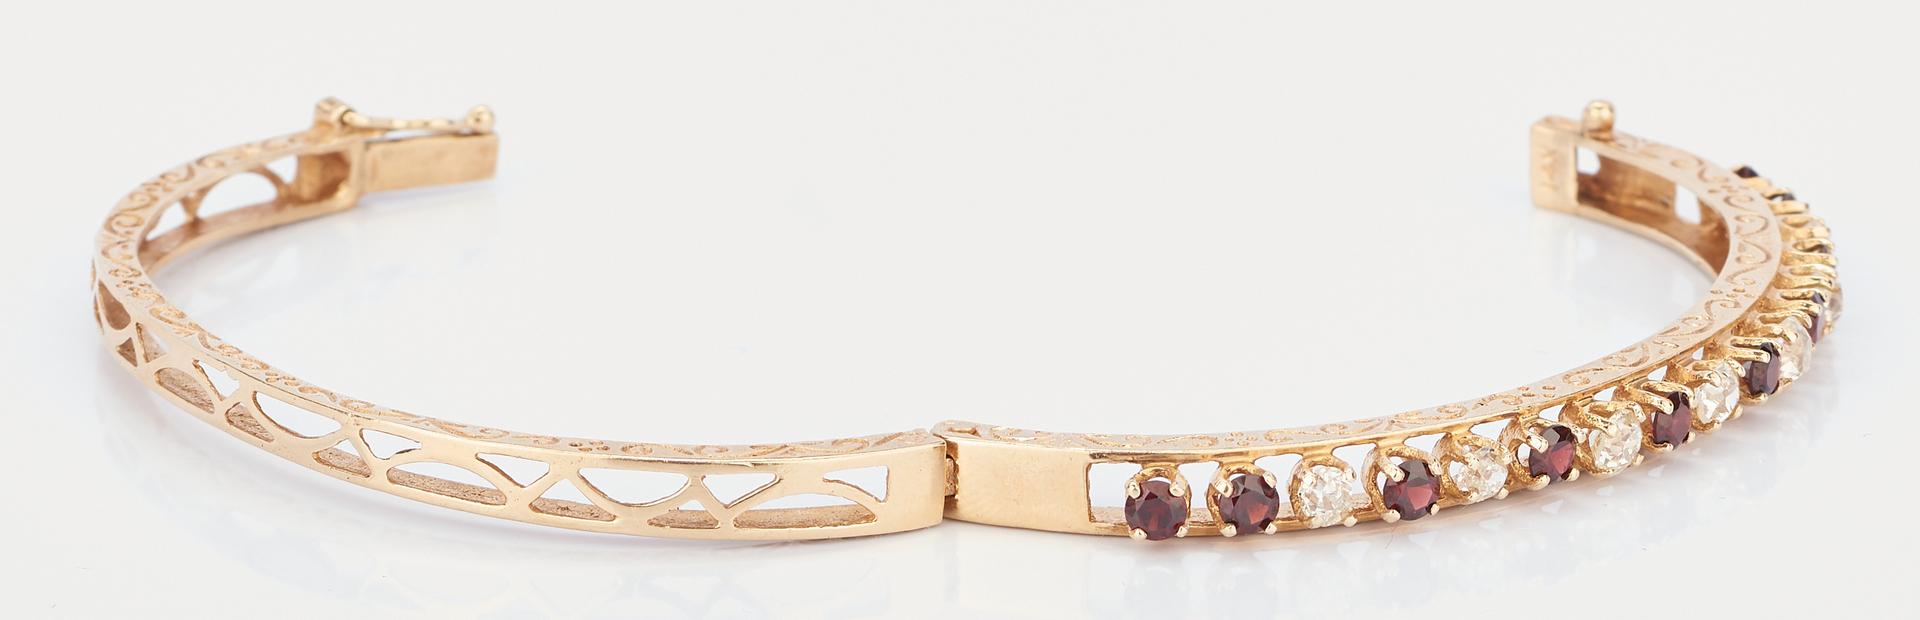 Lot 1022: 14K Diamond and Garnet Bangle Bracelet